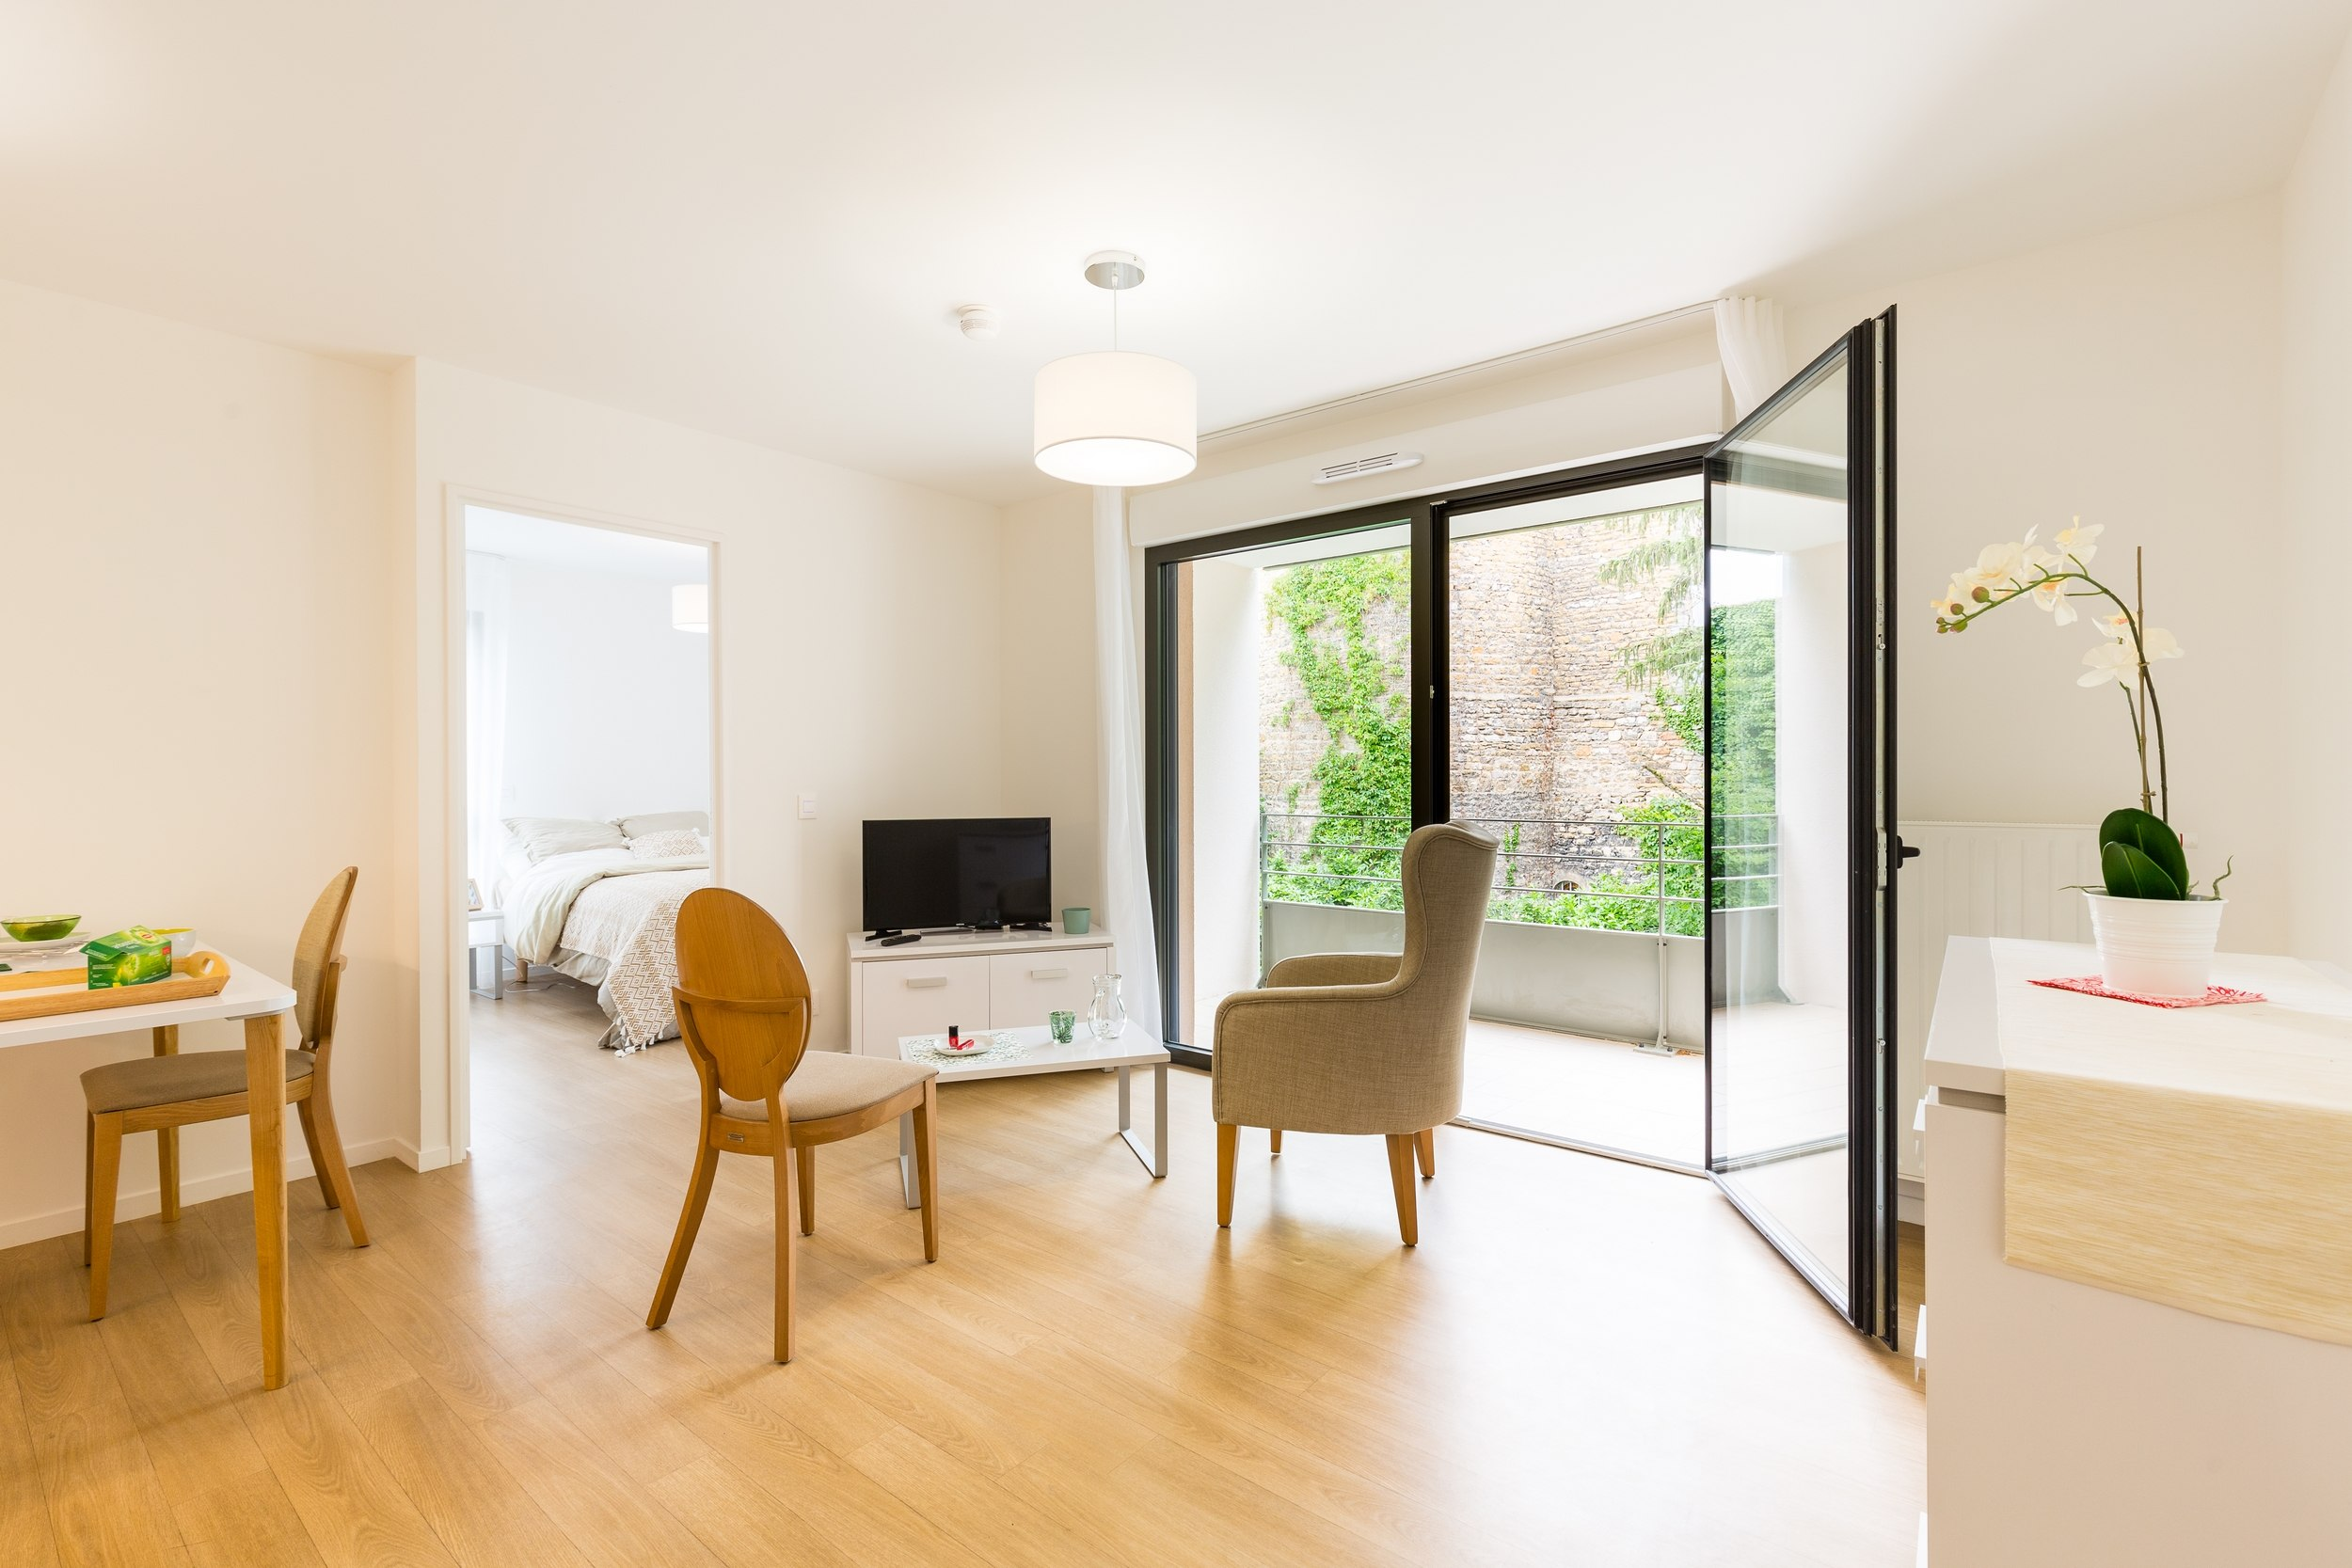 VSS - Appartements (5)